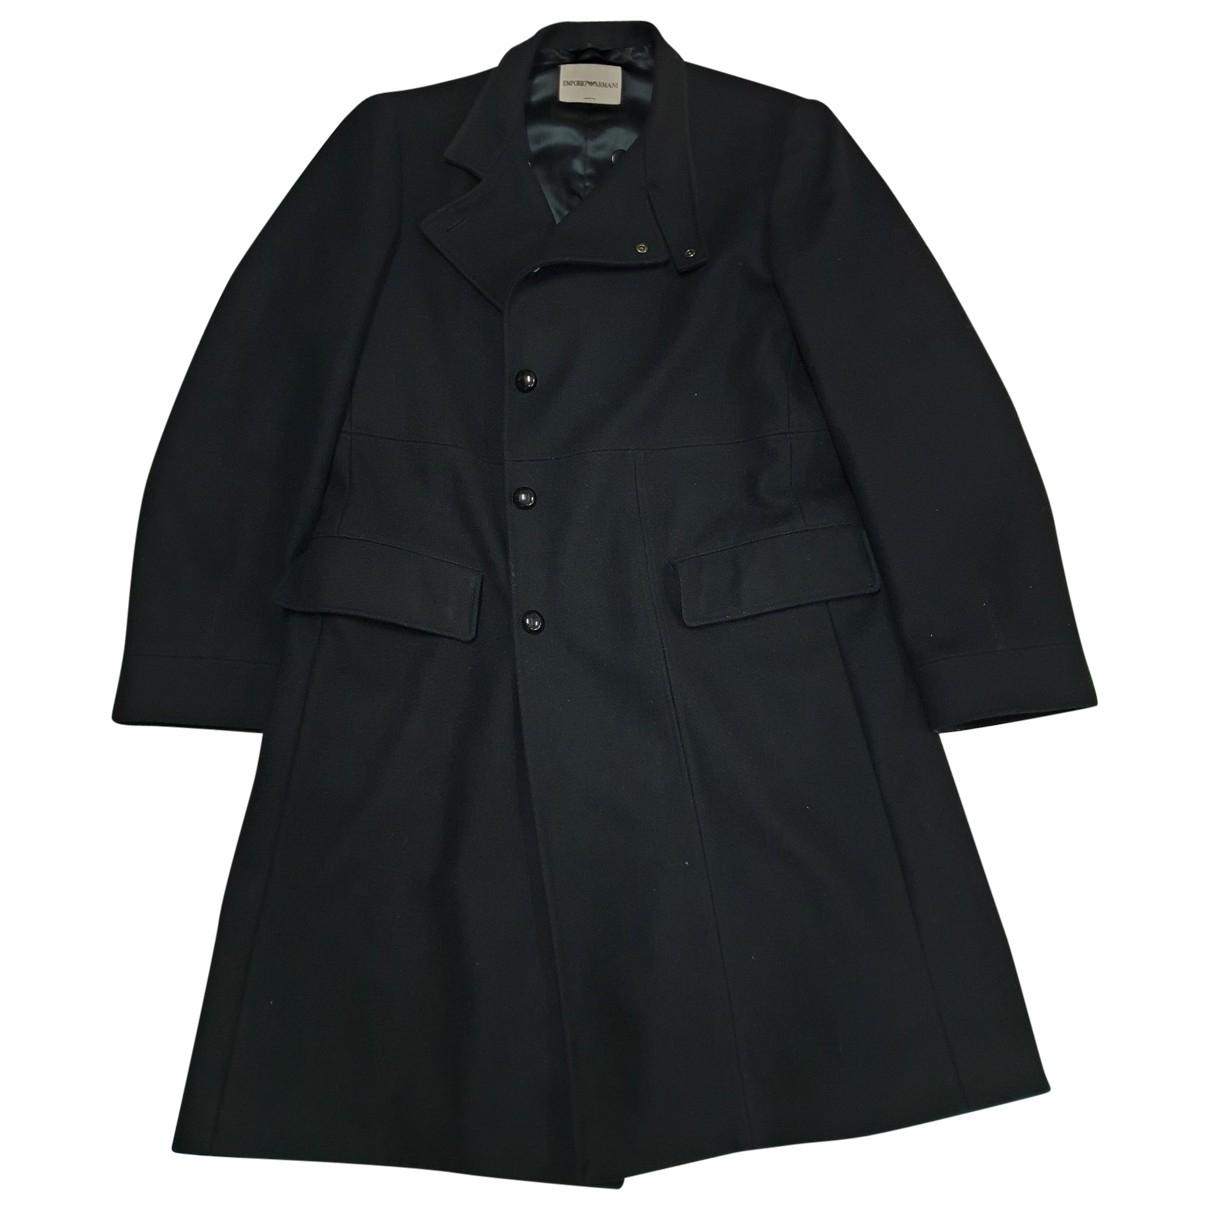 Emporio Armani \N Navy coat  for Men L International